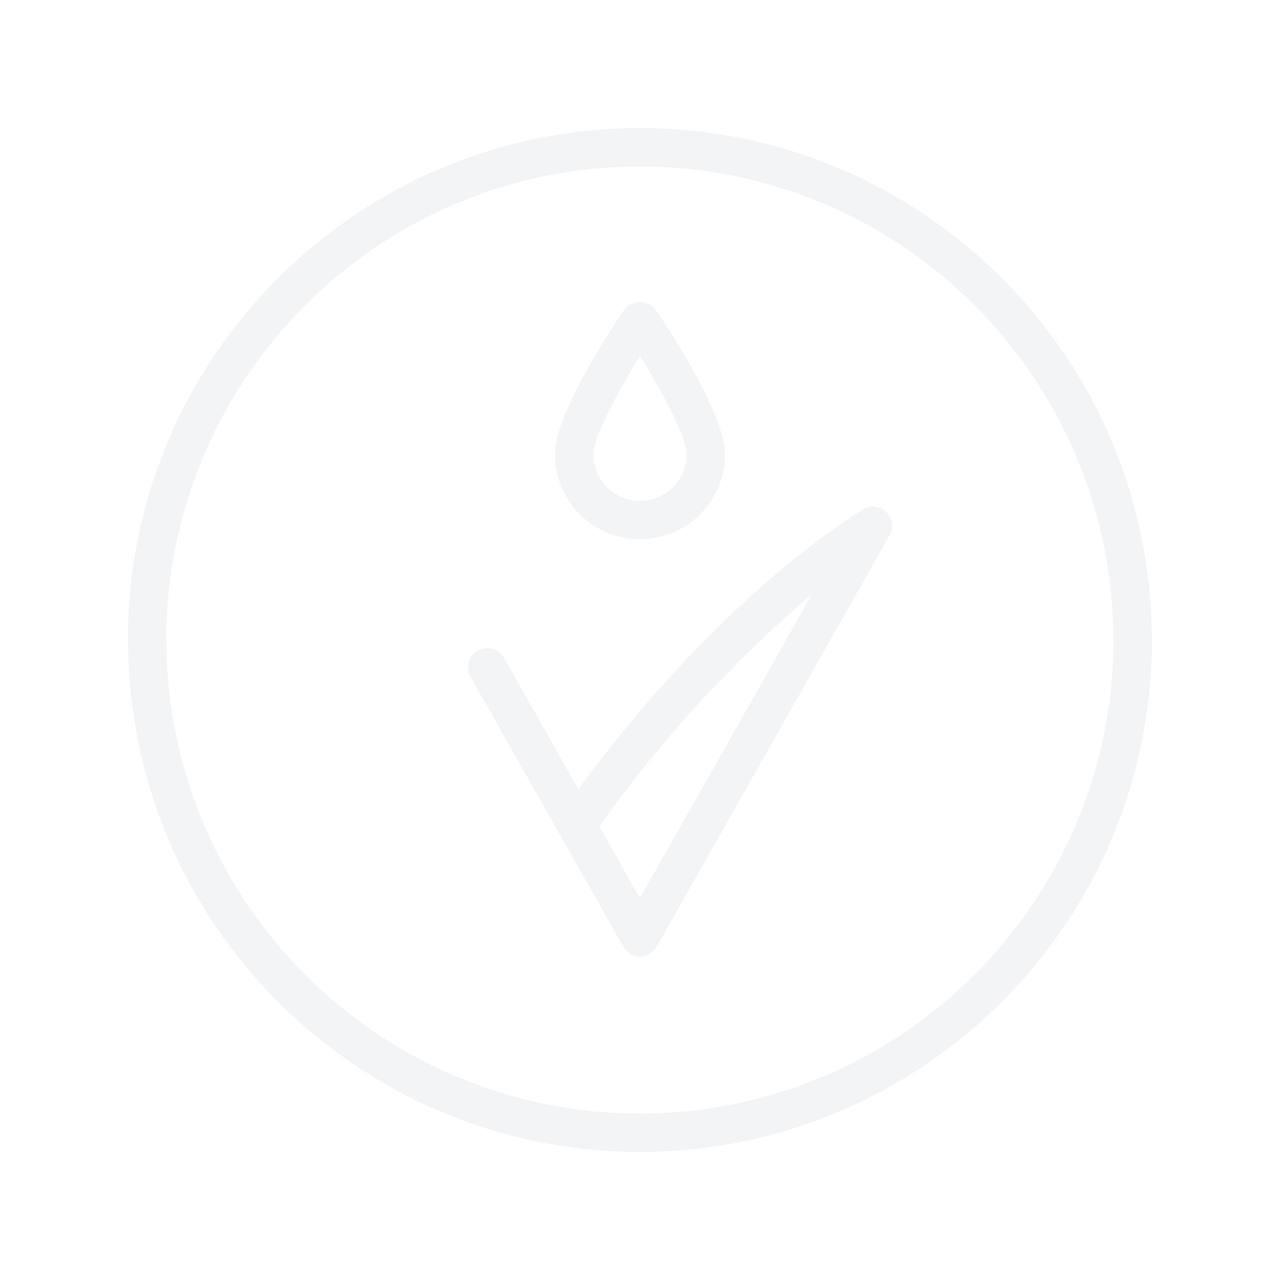 COLLISTAR Rossetto Duo Lipstick 2.5g